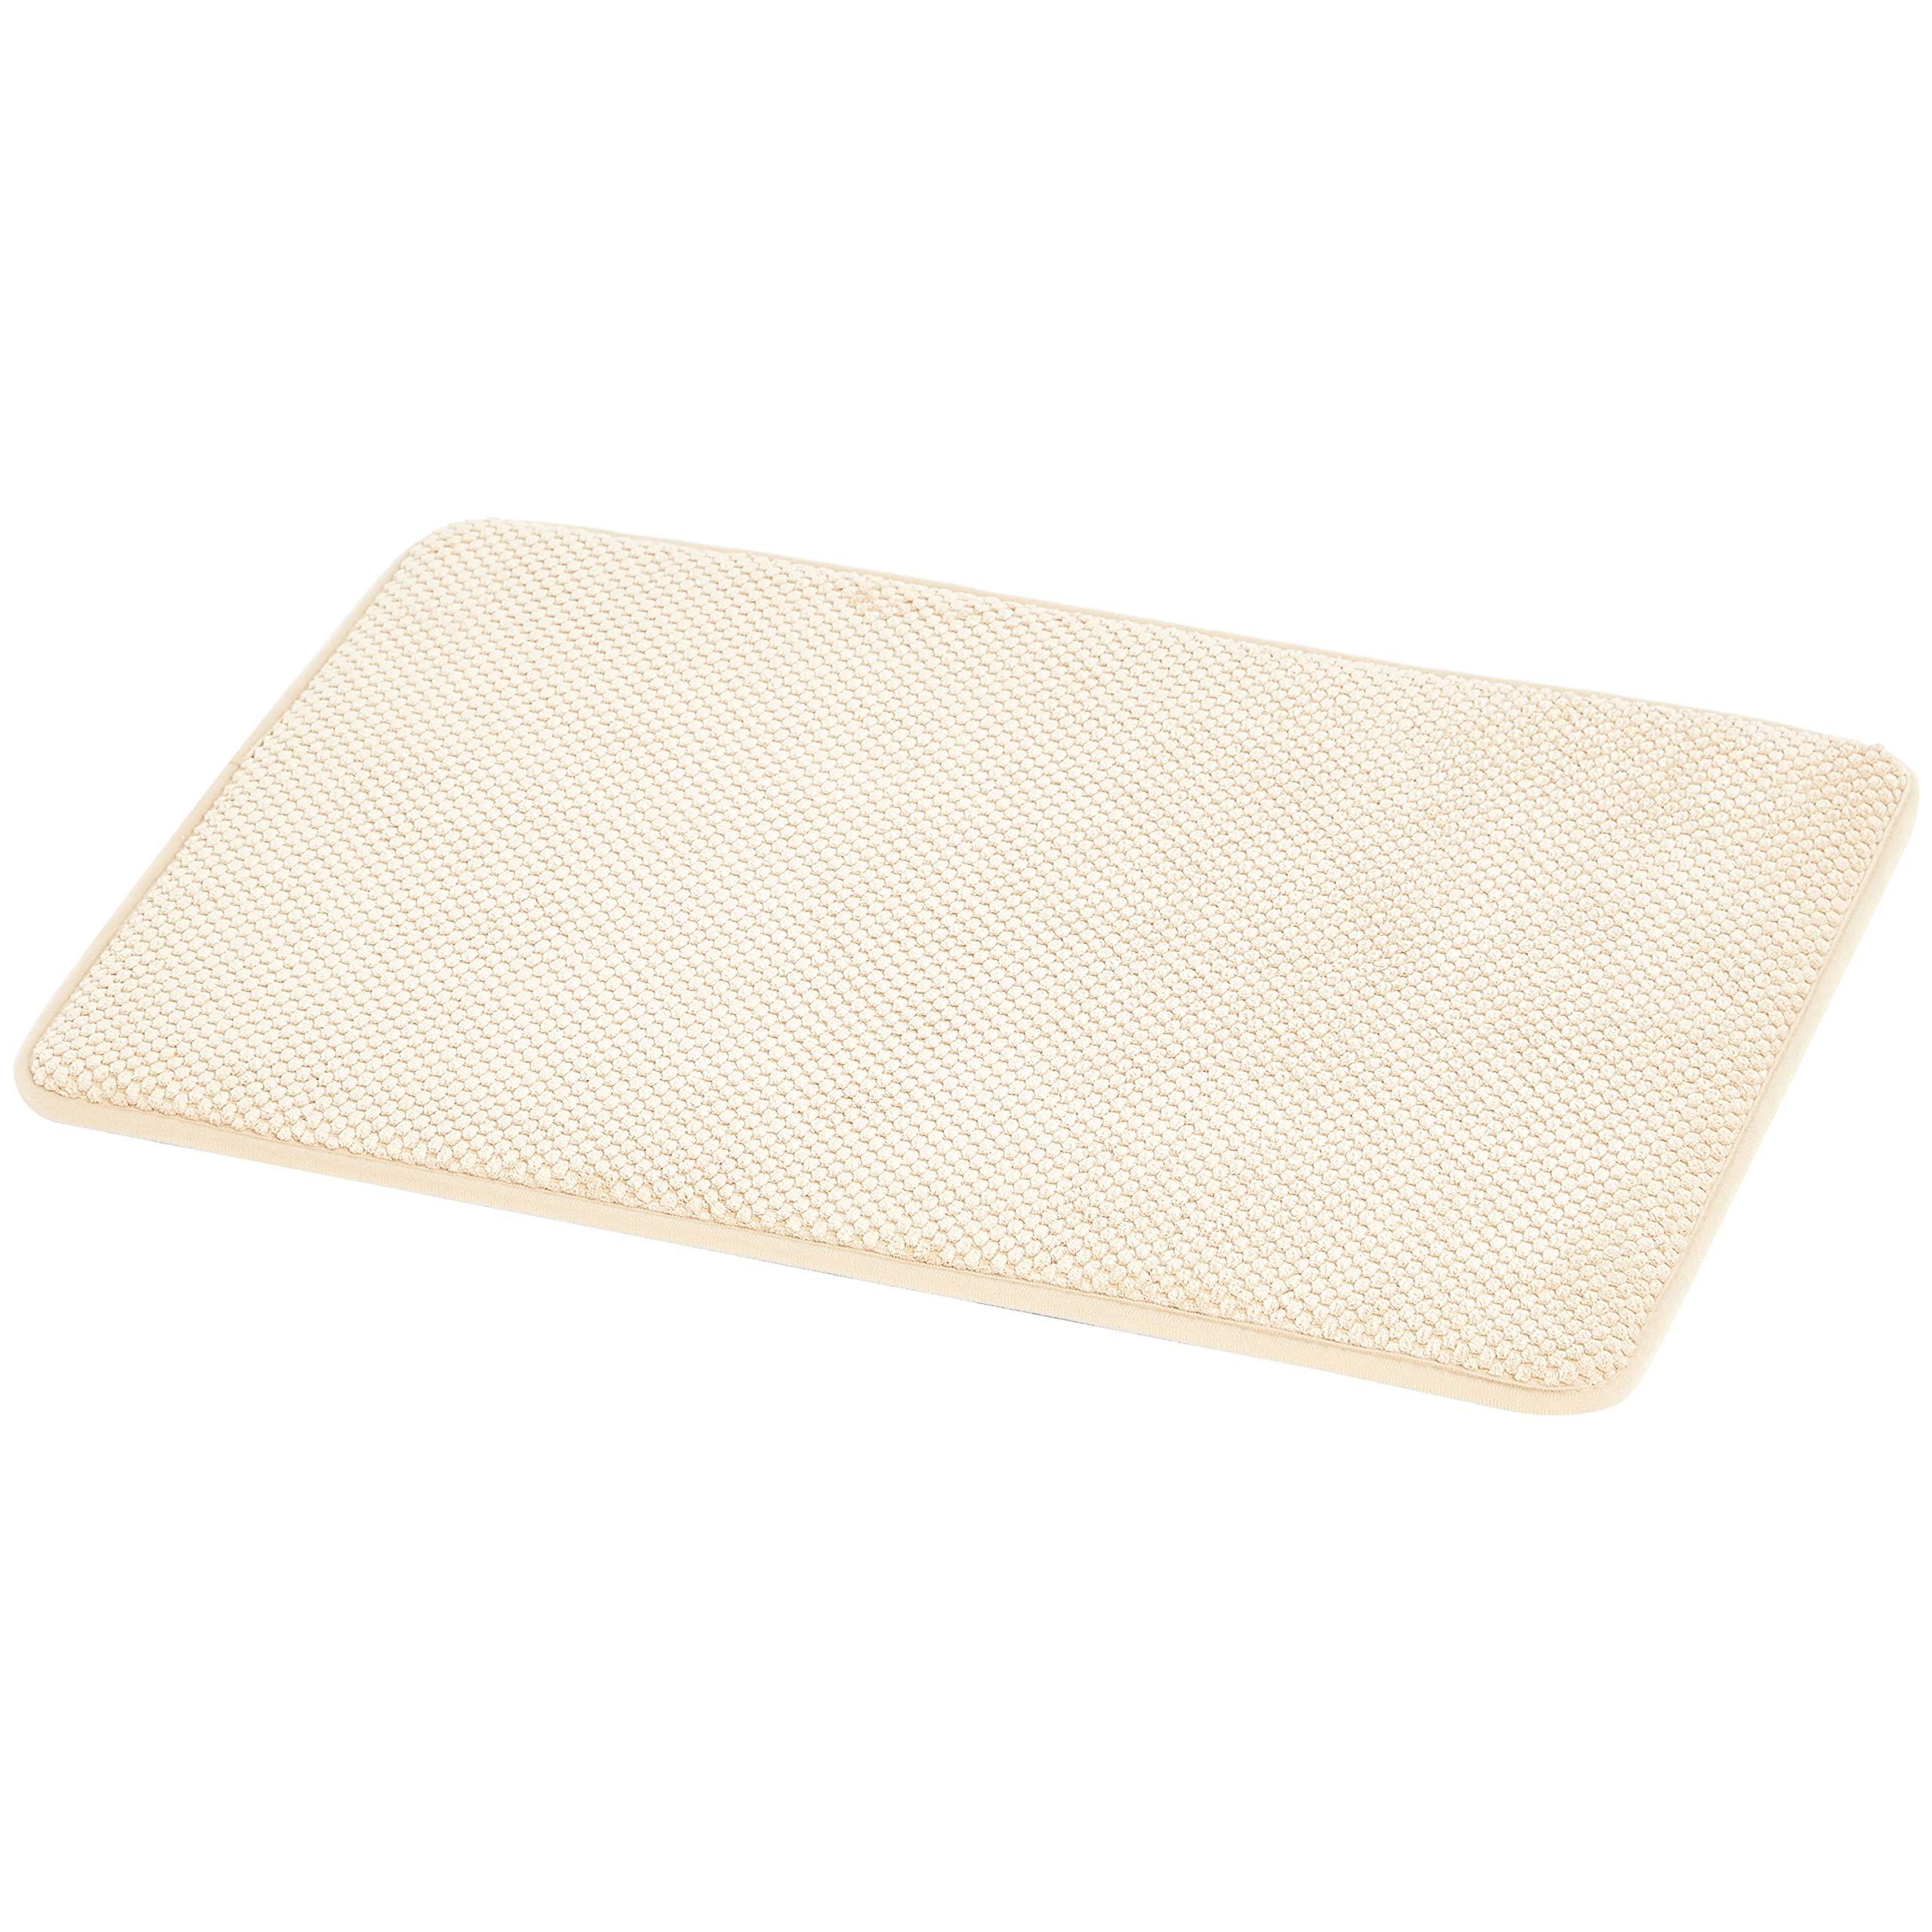 AmazonBasics Textured Memory Foam Bath Mat - Small, Beige